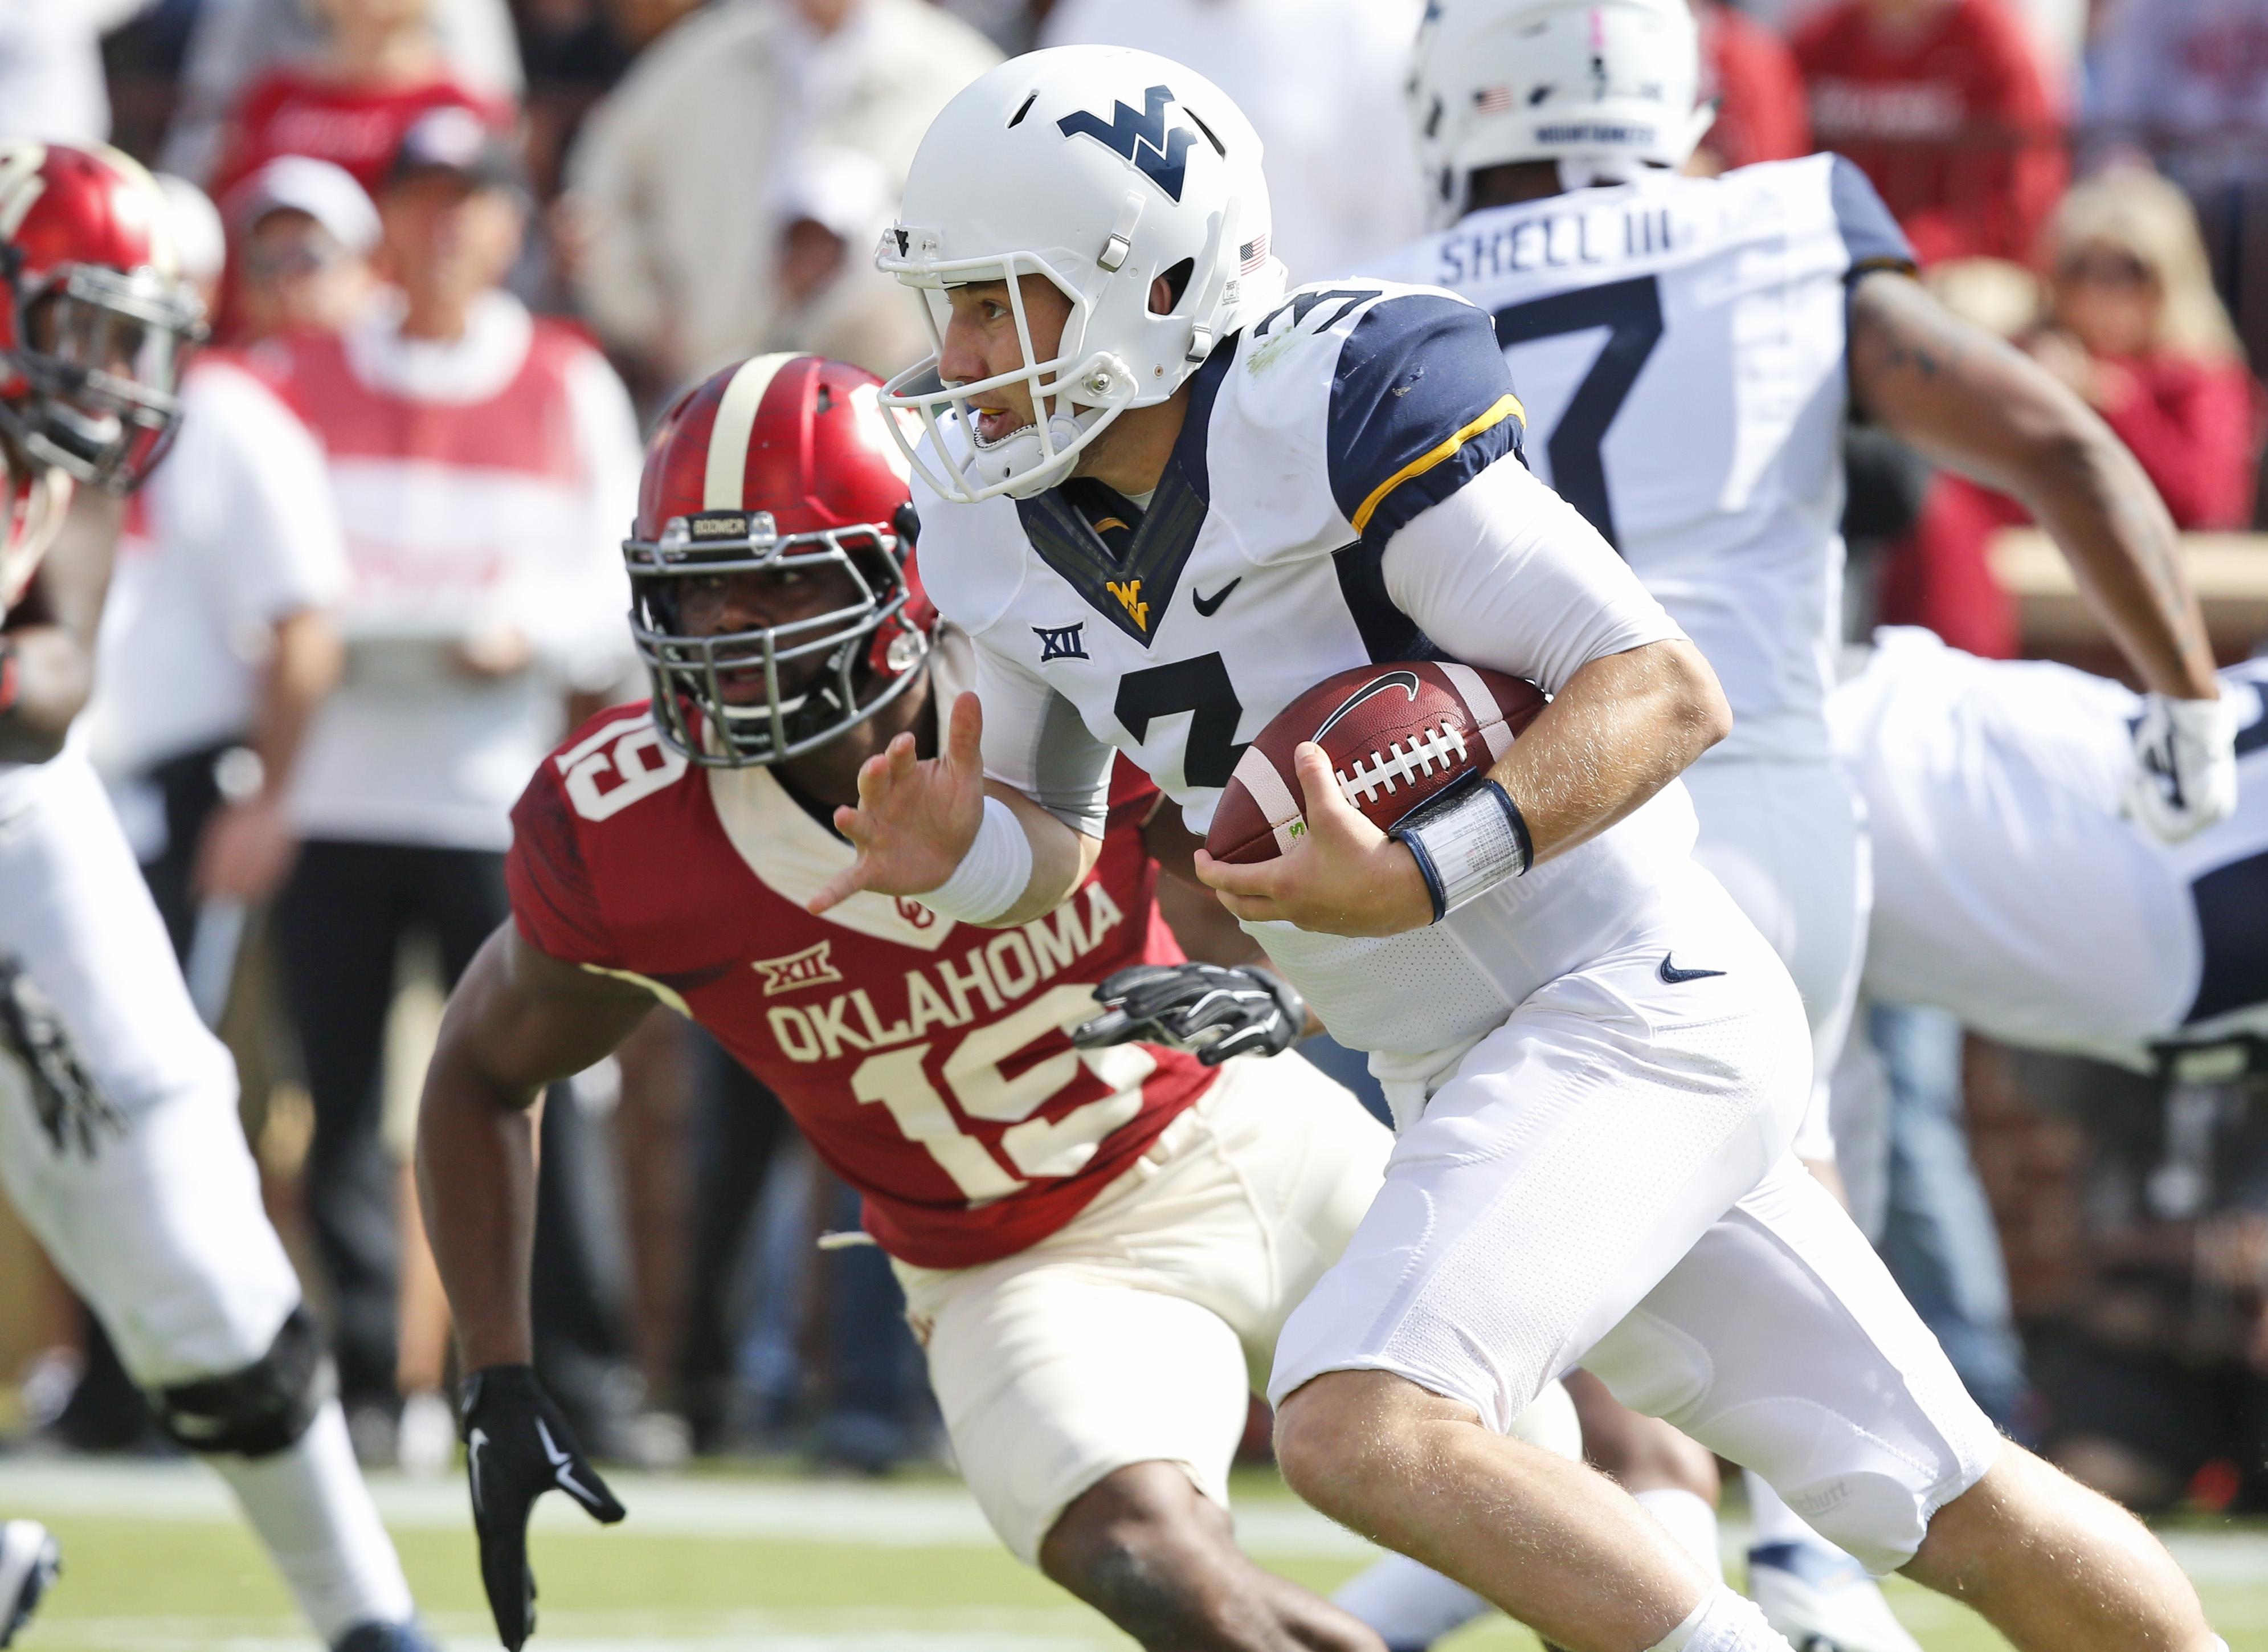 West Virginia quarterback Skyler Howard (3) runs past Oklahoma linebacker Eric Striker (19) in the first quarter of an NCAA college football game in Norman, Okla., Saturday, Oct. 3, 2015. (AP Photo/Sue Ogrocki)